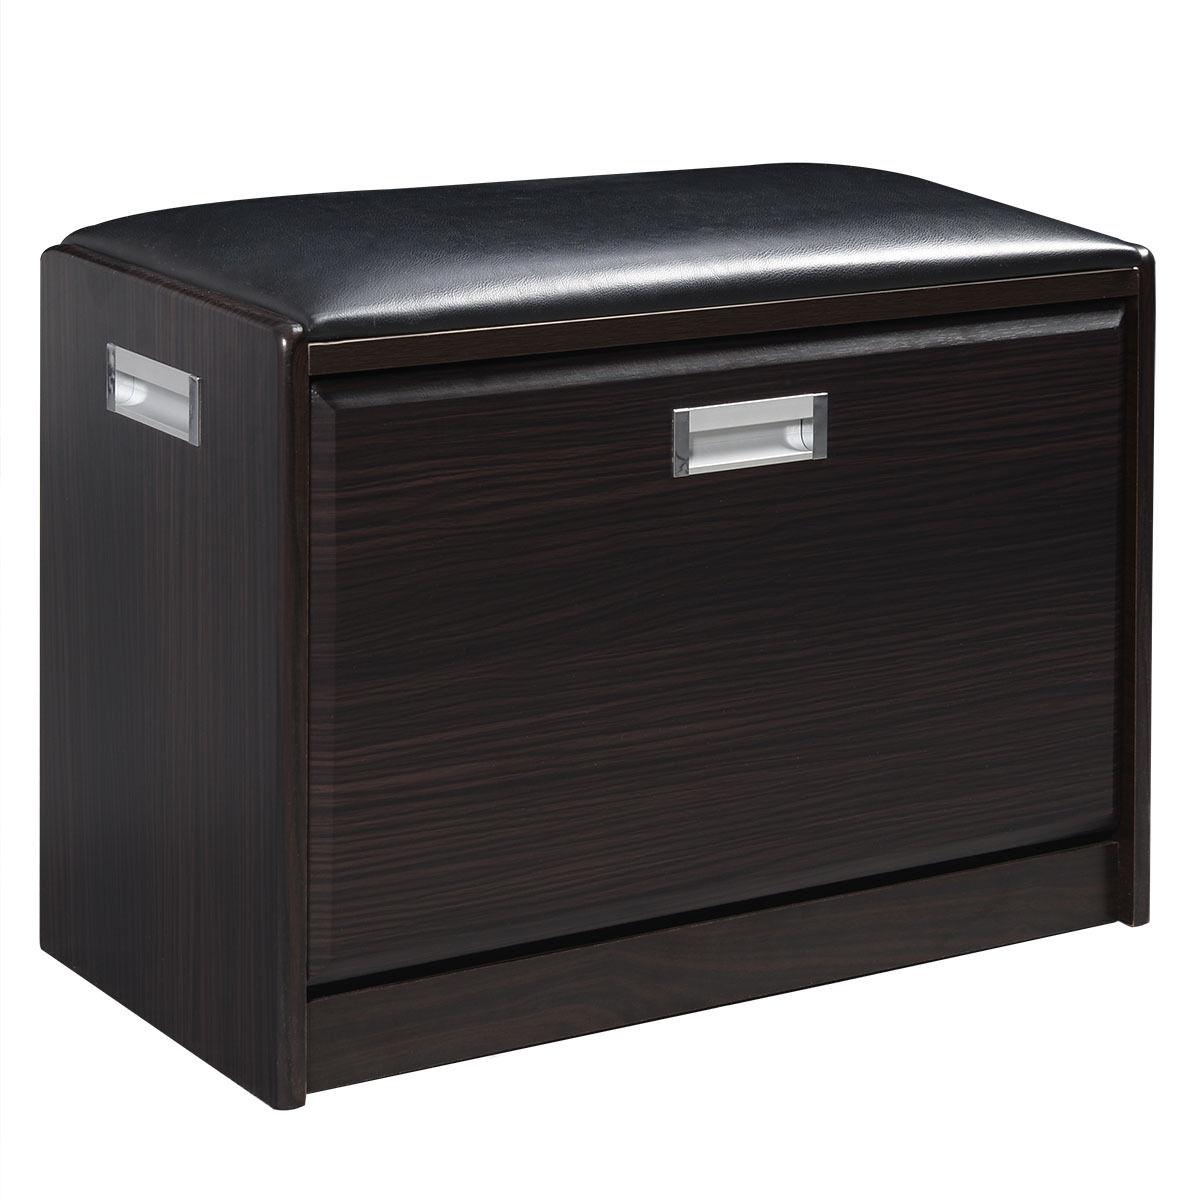 Practical Wooden Shoe Cabinet Closet Storage Rack +PU Seat Bench Entryway Hallway Black<br>